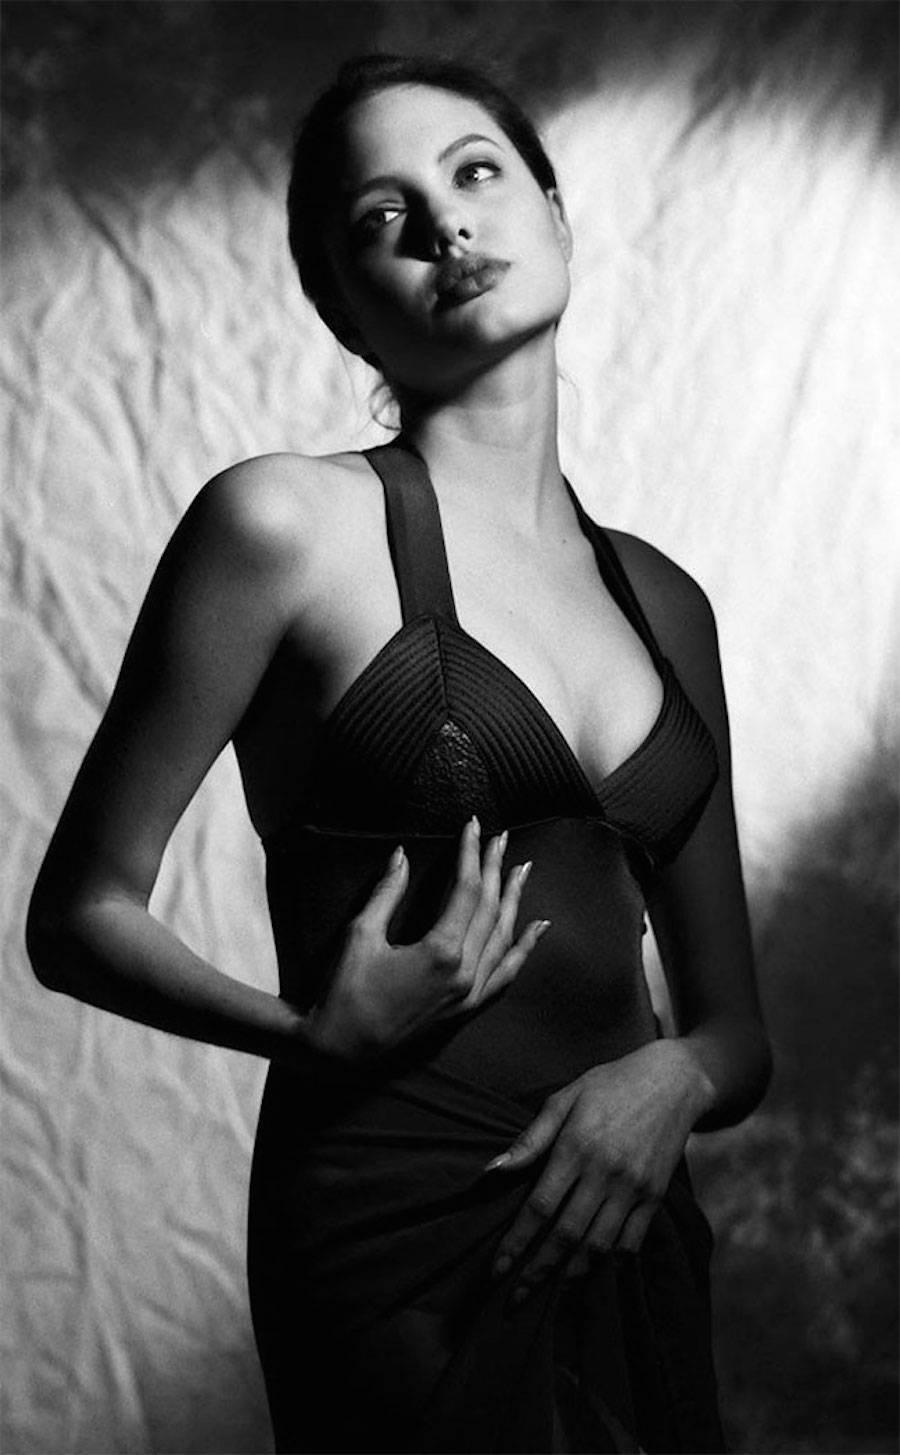 Гарри Лэнгдон фотосессия Анджелины Джоли 12